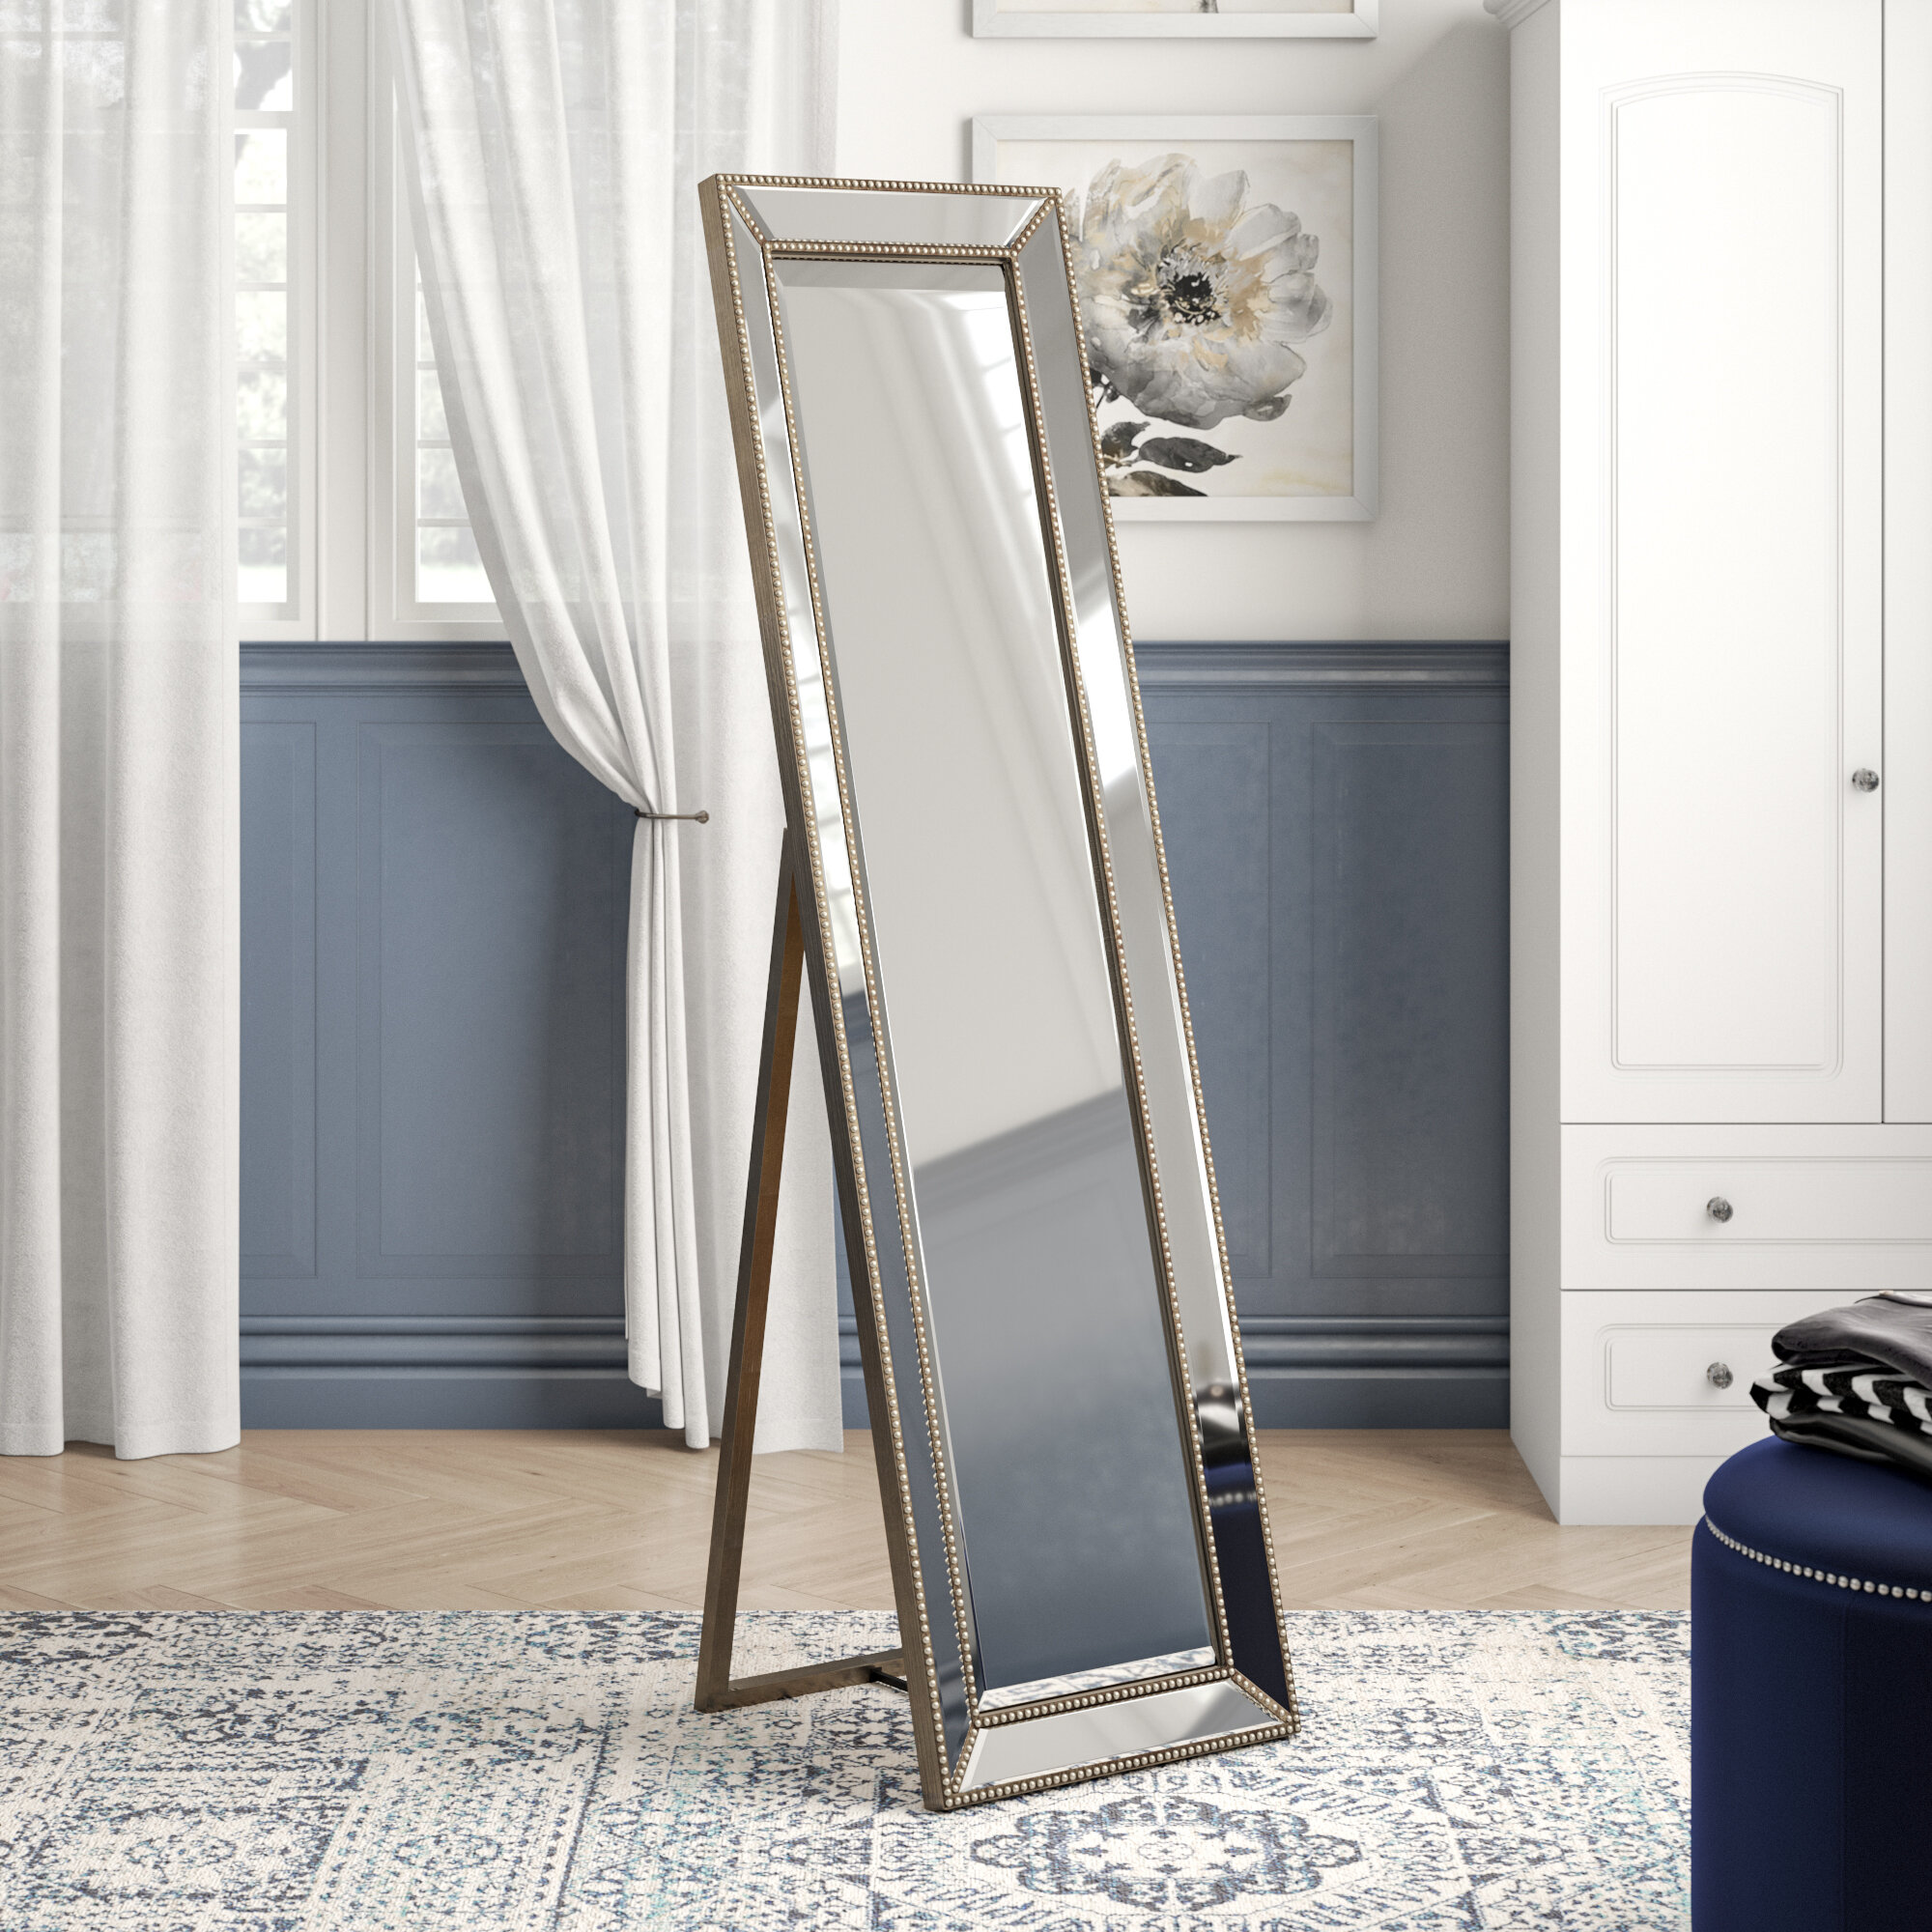 Cheap Beveled Full Length Mirror Furniture Online